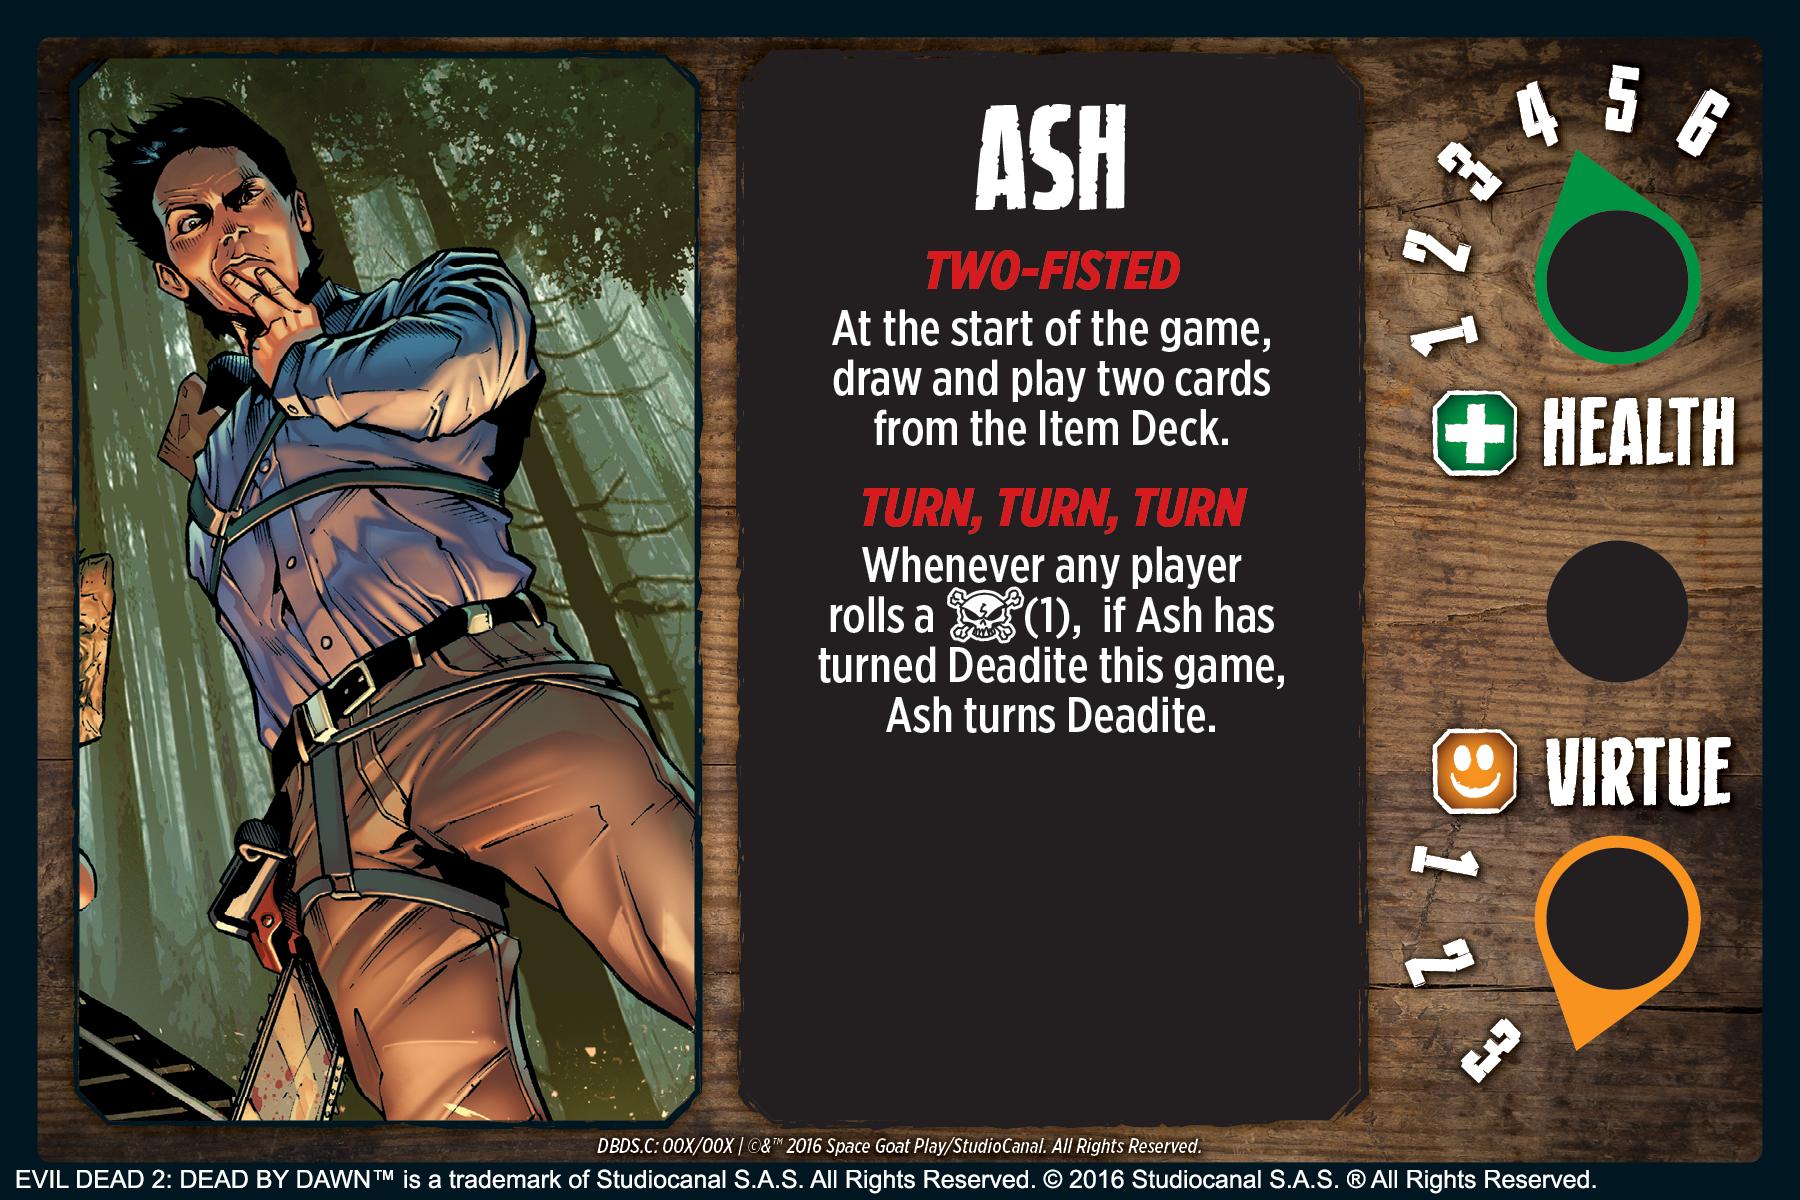 evildead2game-AshCard